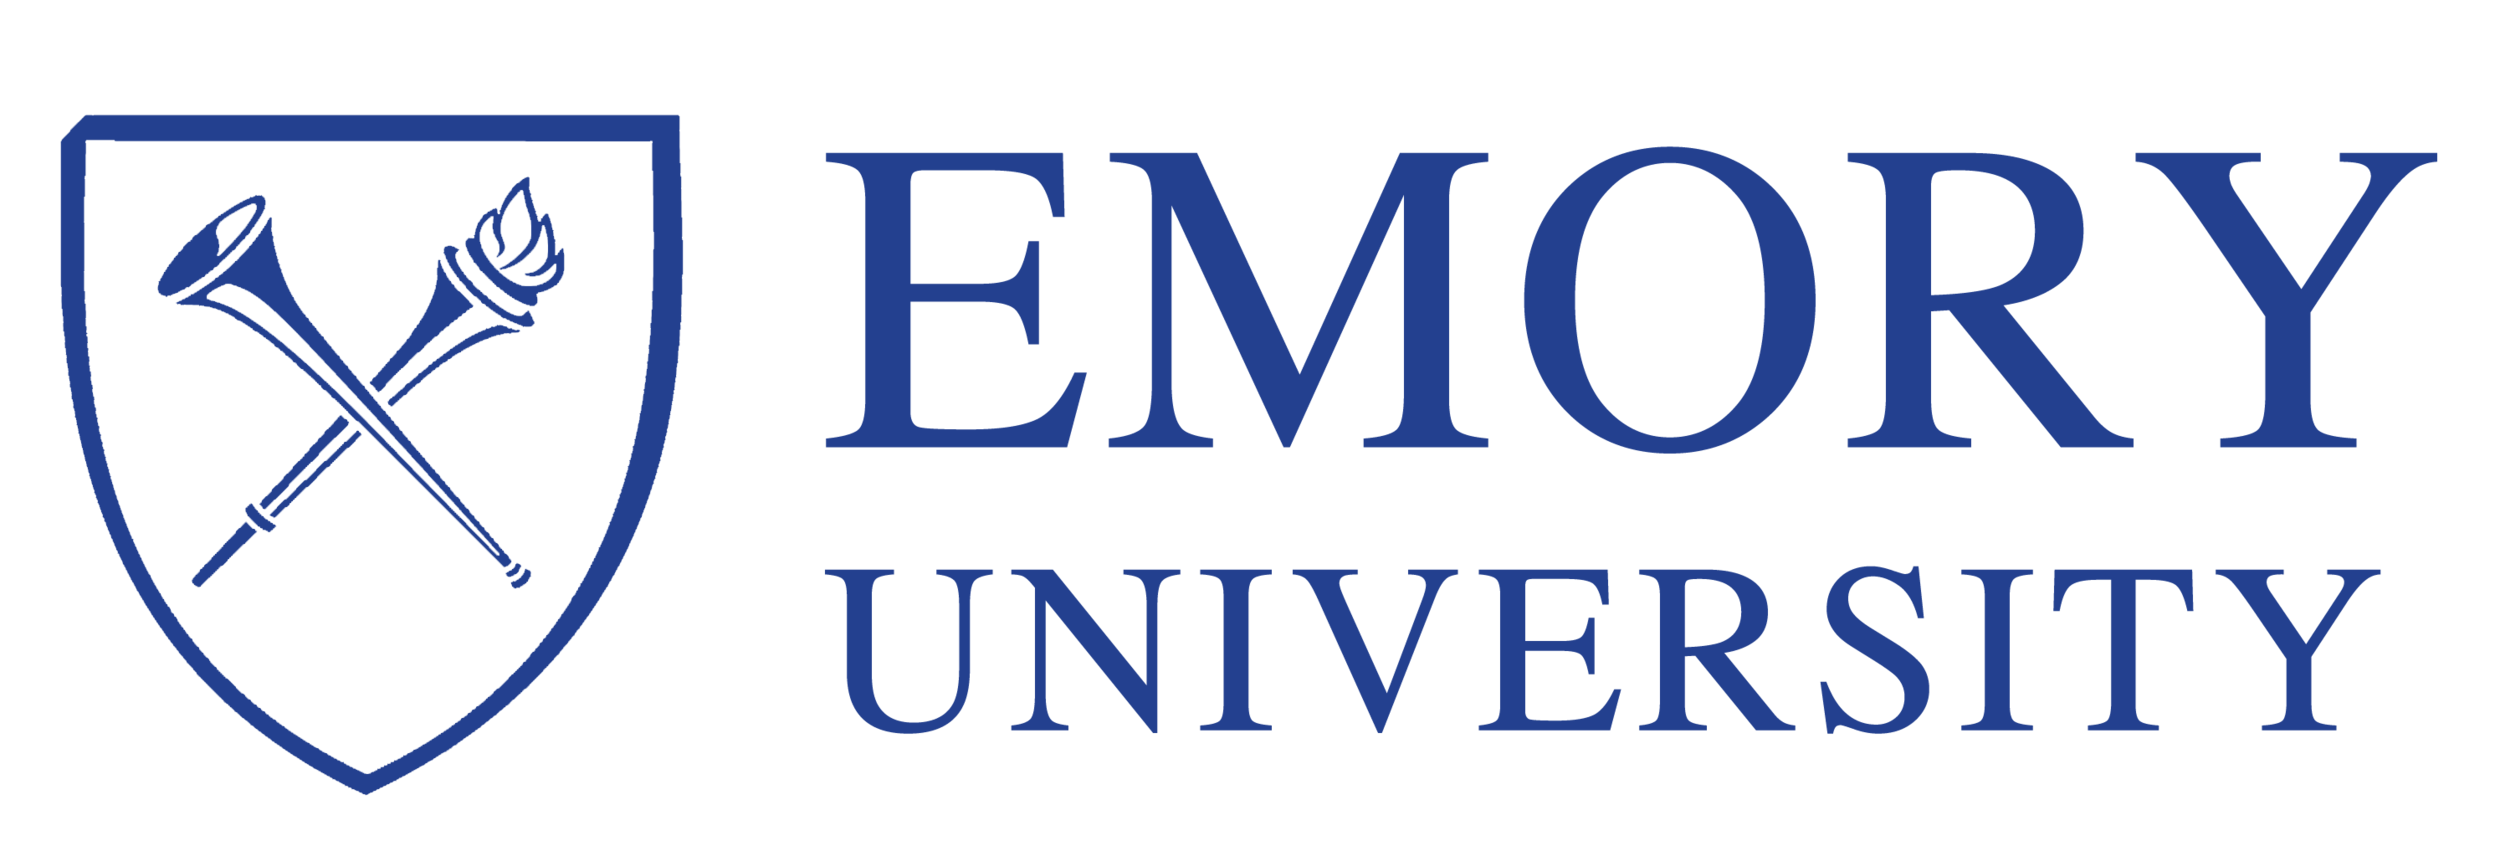 Emory Univ.png